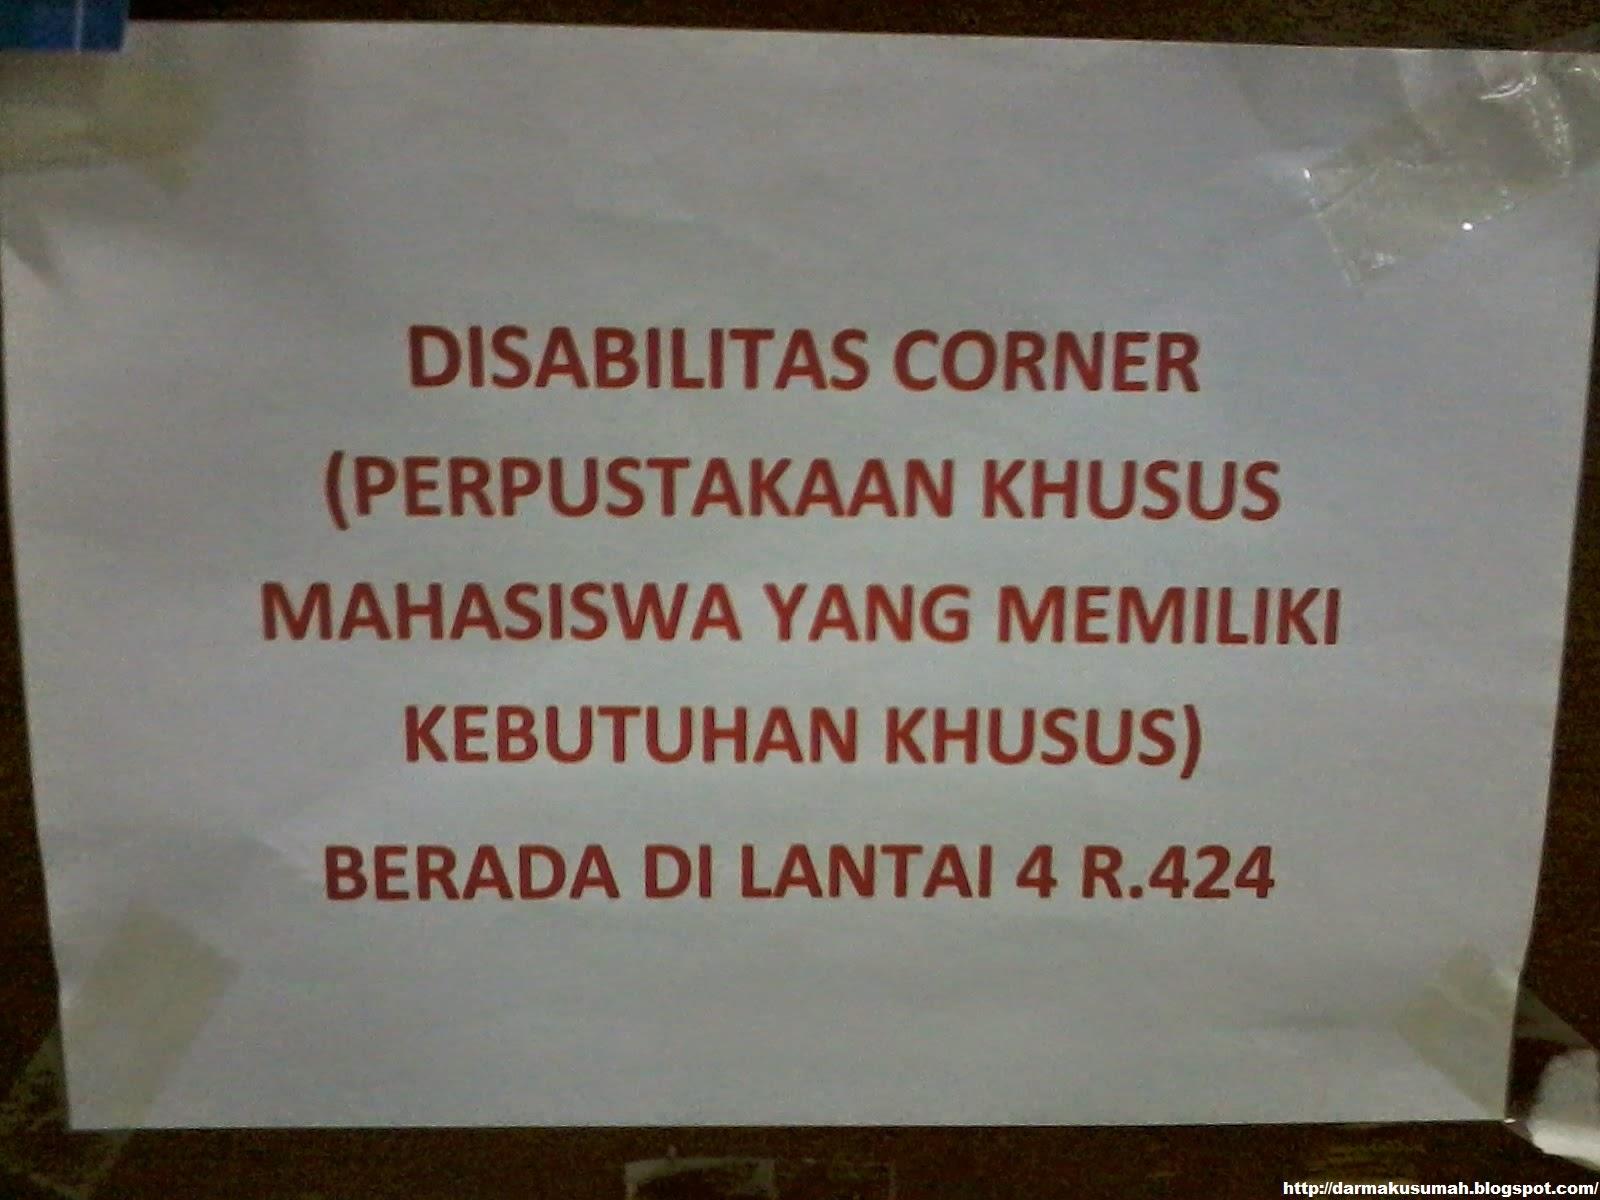 Pengumuman Disabilitas Corner